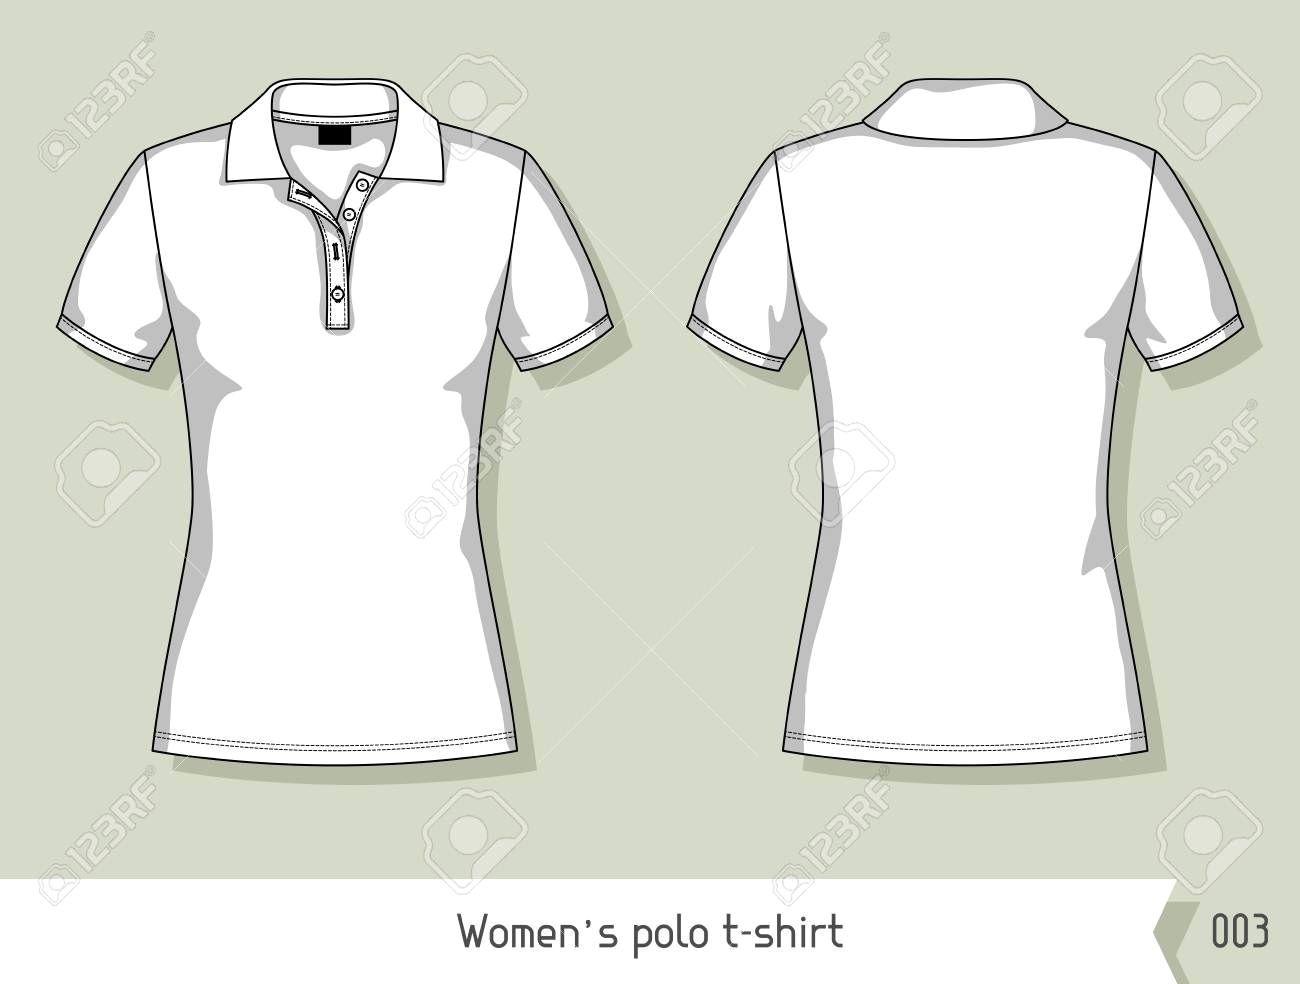 Editable T Shirt Template What Makes Editable T Shirt